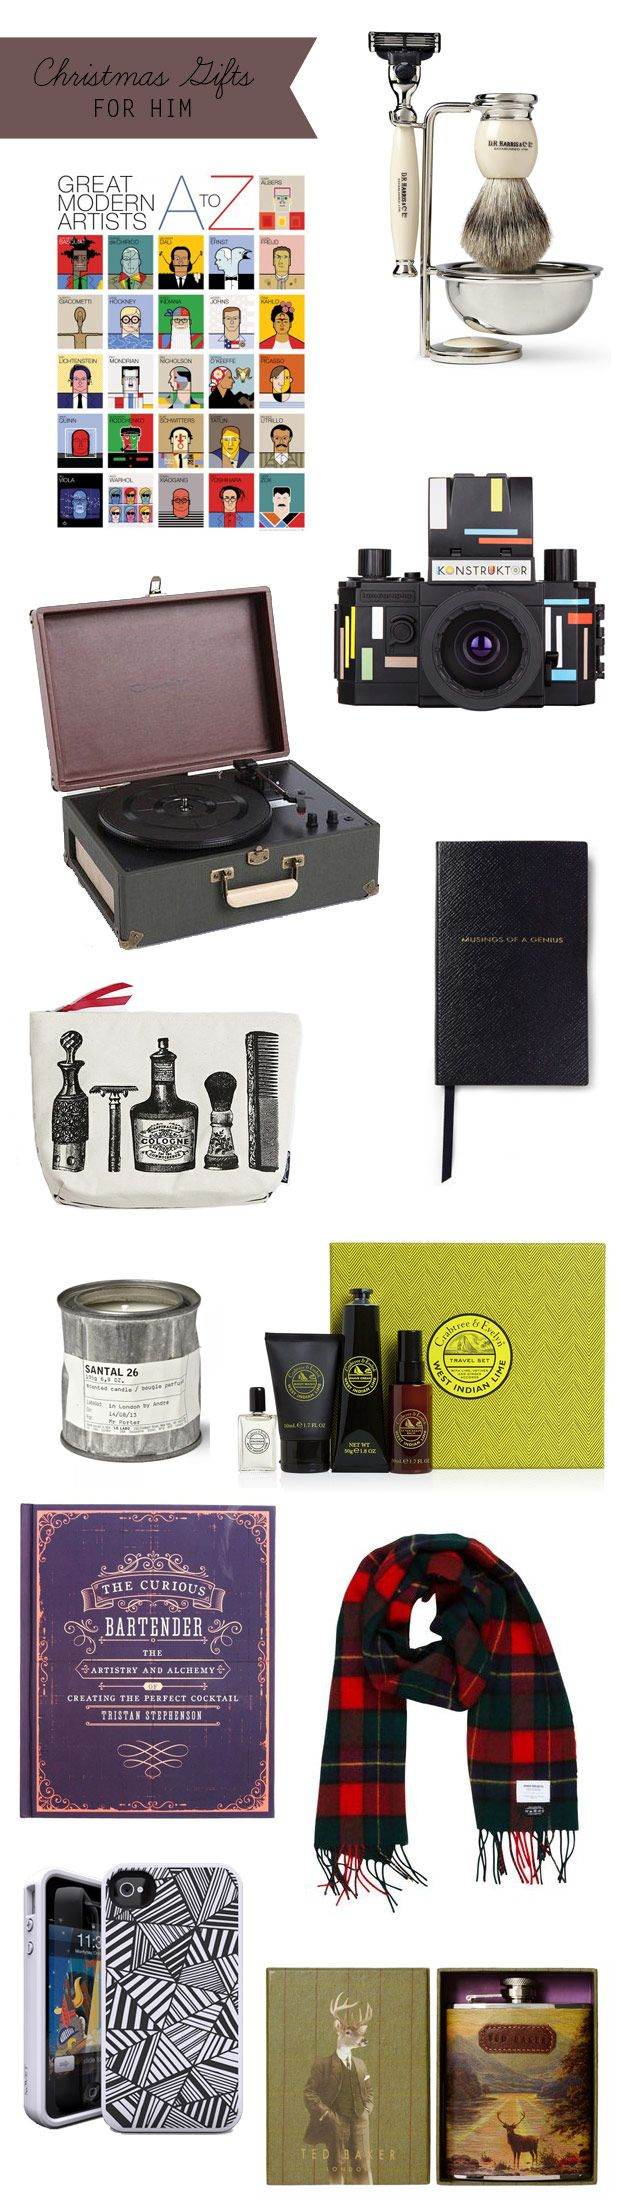 Christmas Gift Guide for Him | onefabday.com